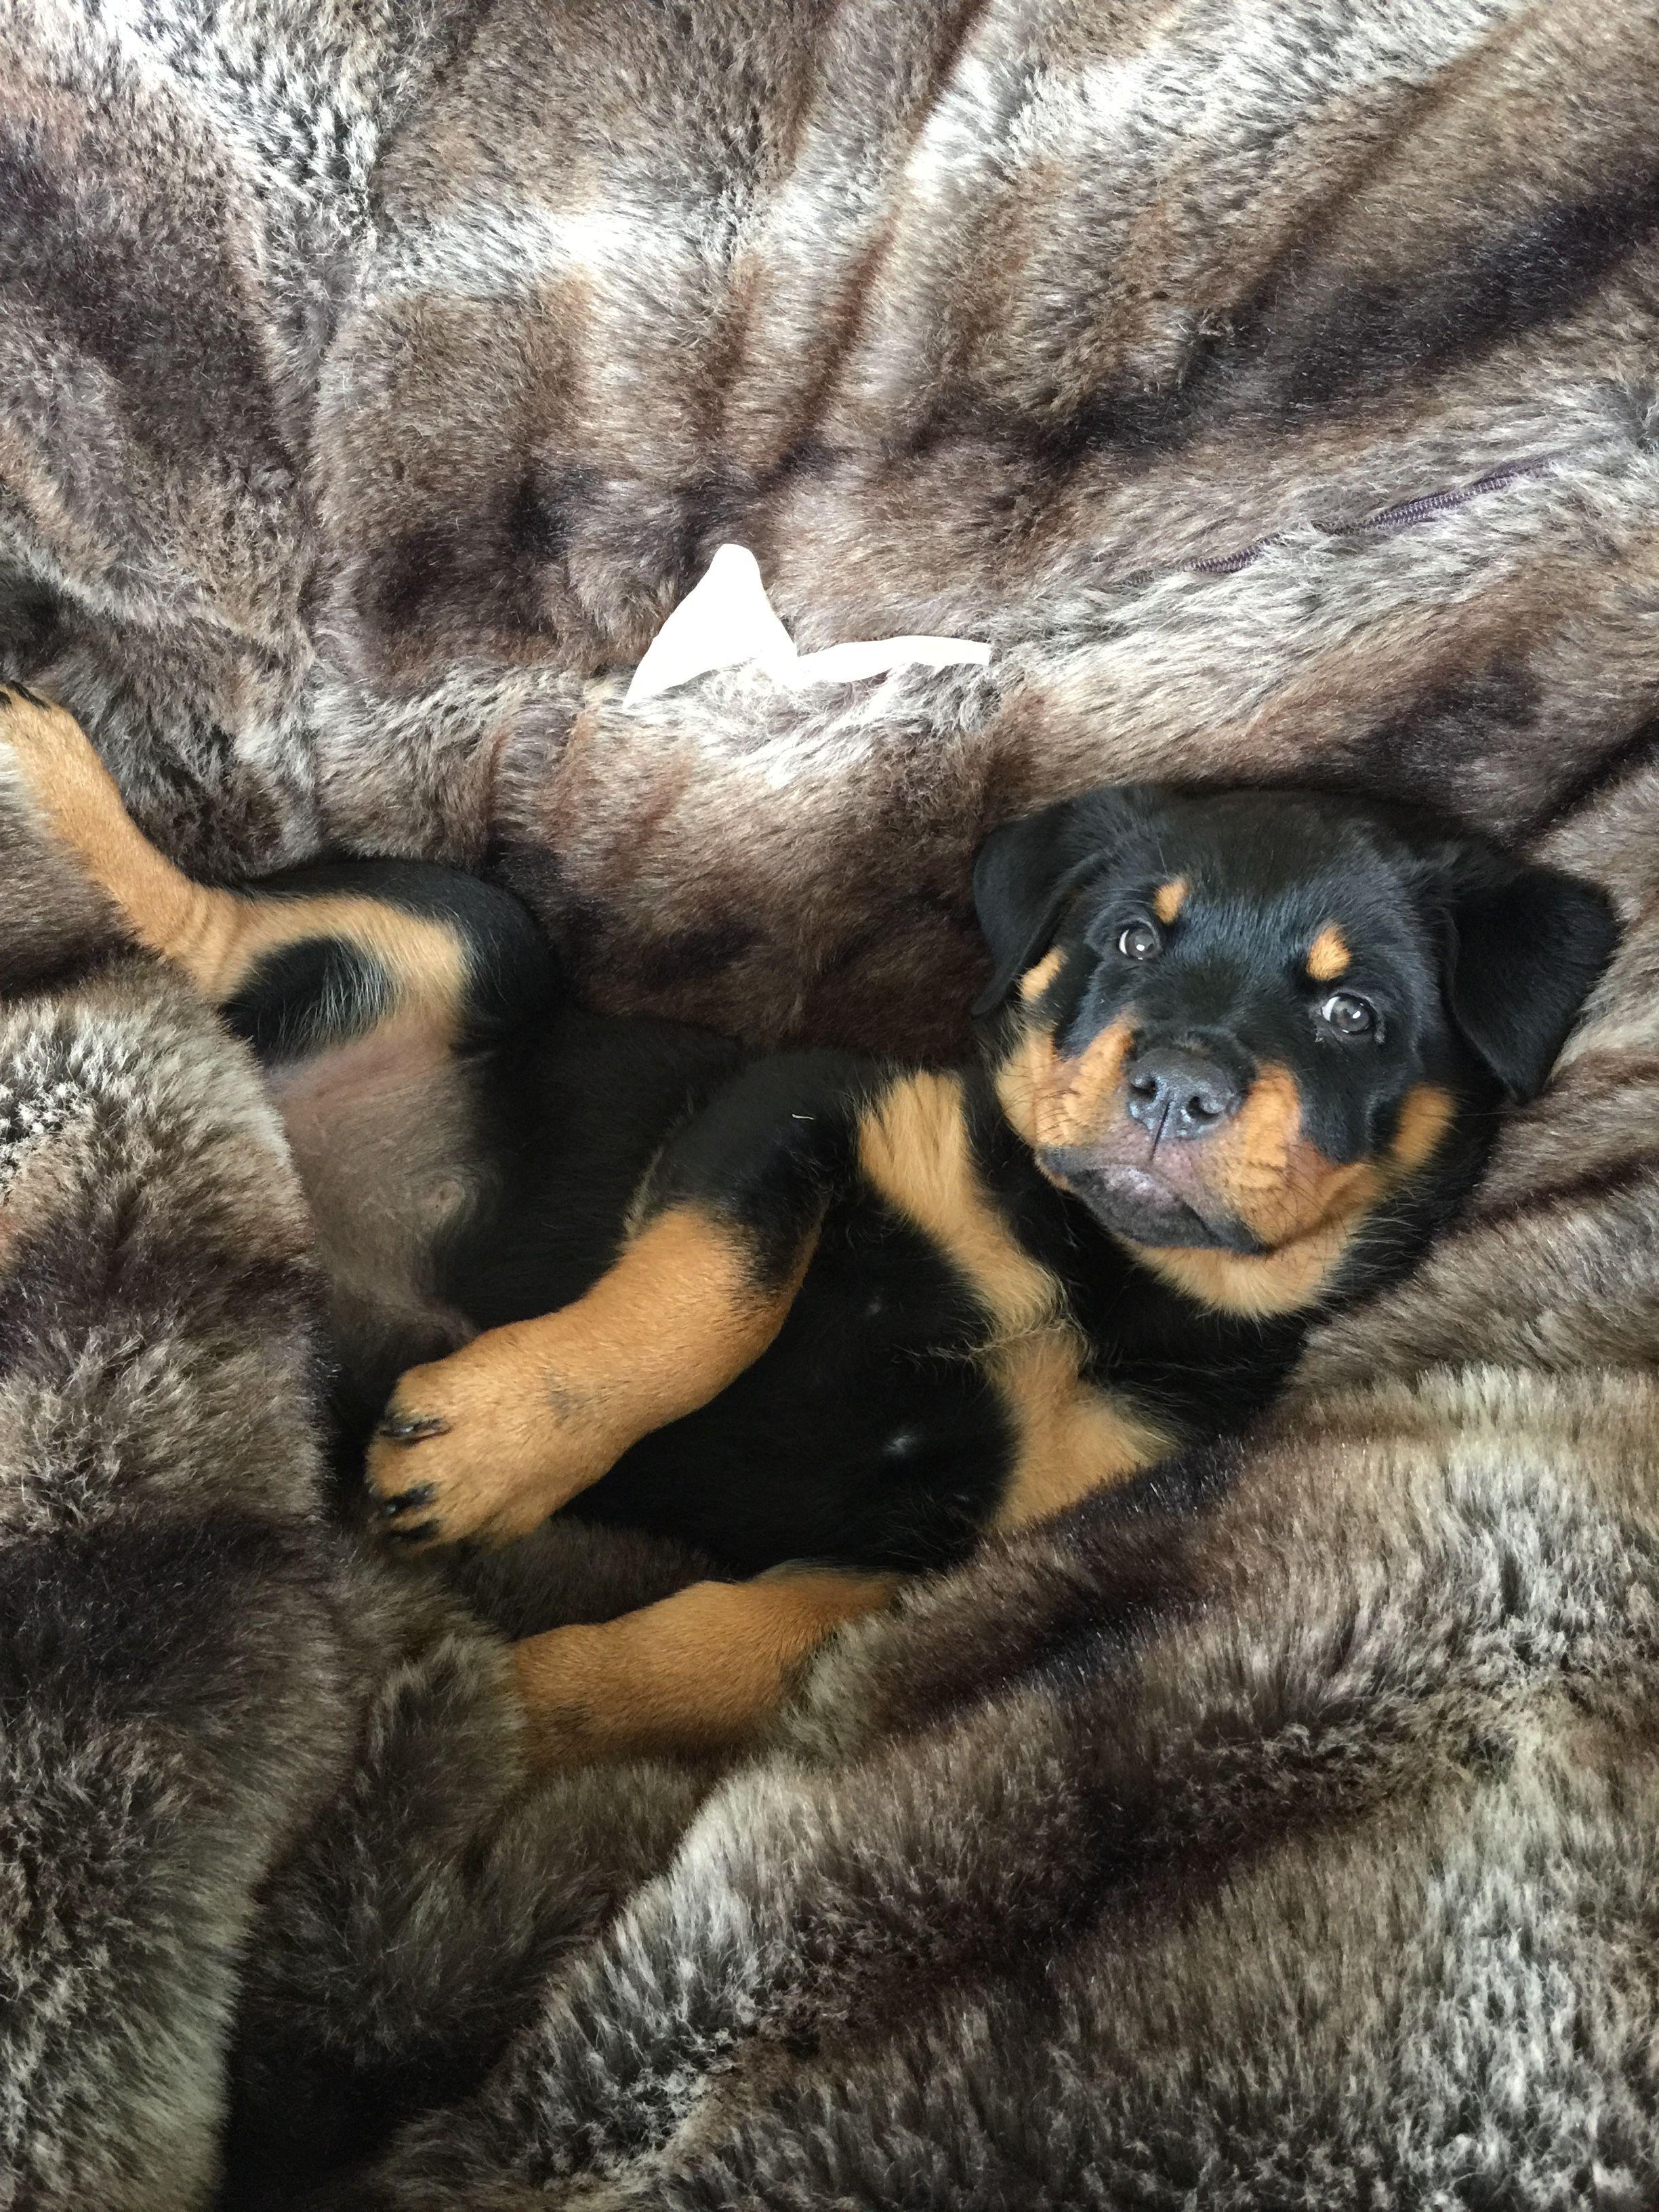 8 Week Rottweiler Puppy Rottweiler Puppies Rottweiler Training Your Dog